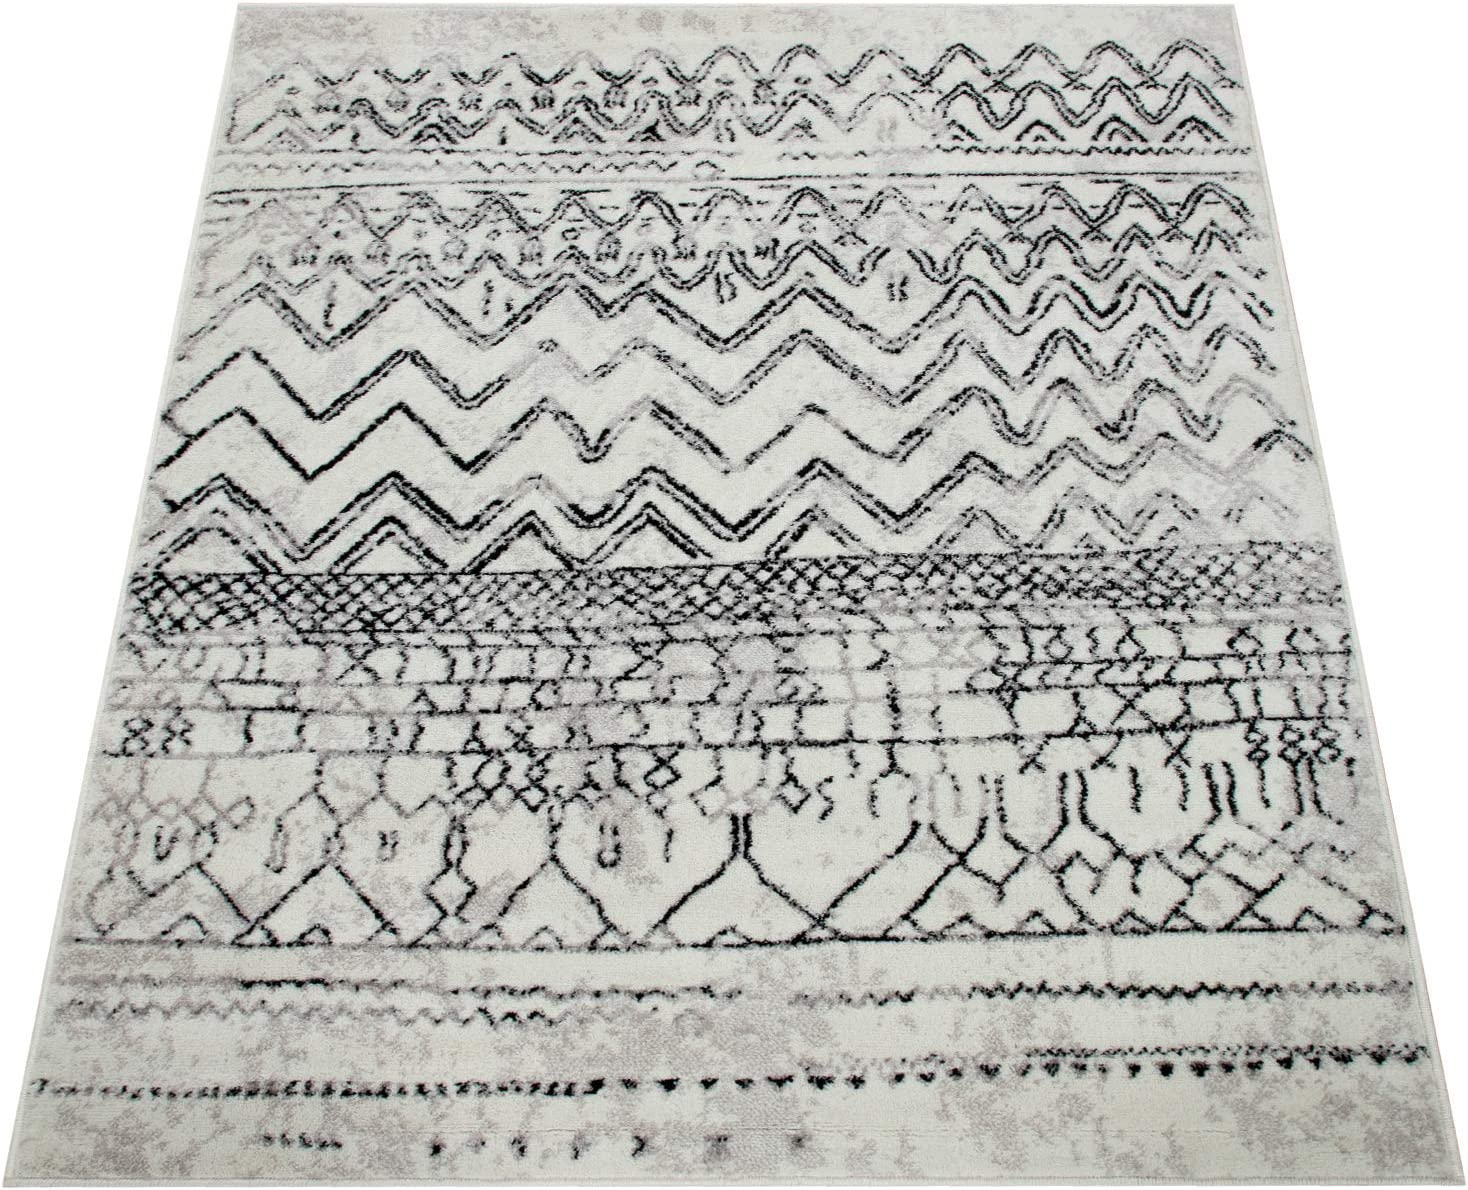 Alfombra Sal/ón Dise/ño Vintage con Motivos Escandinavos Pelo Corto Crema Gris tama/ño:60x100 cm